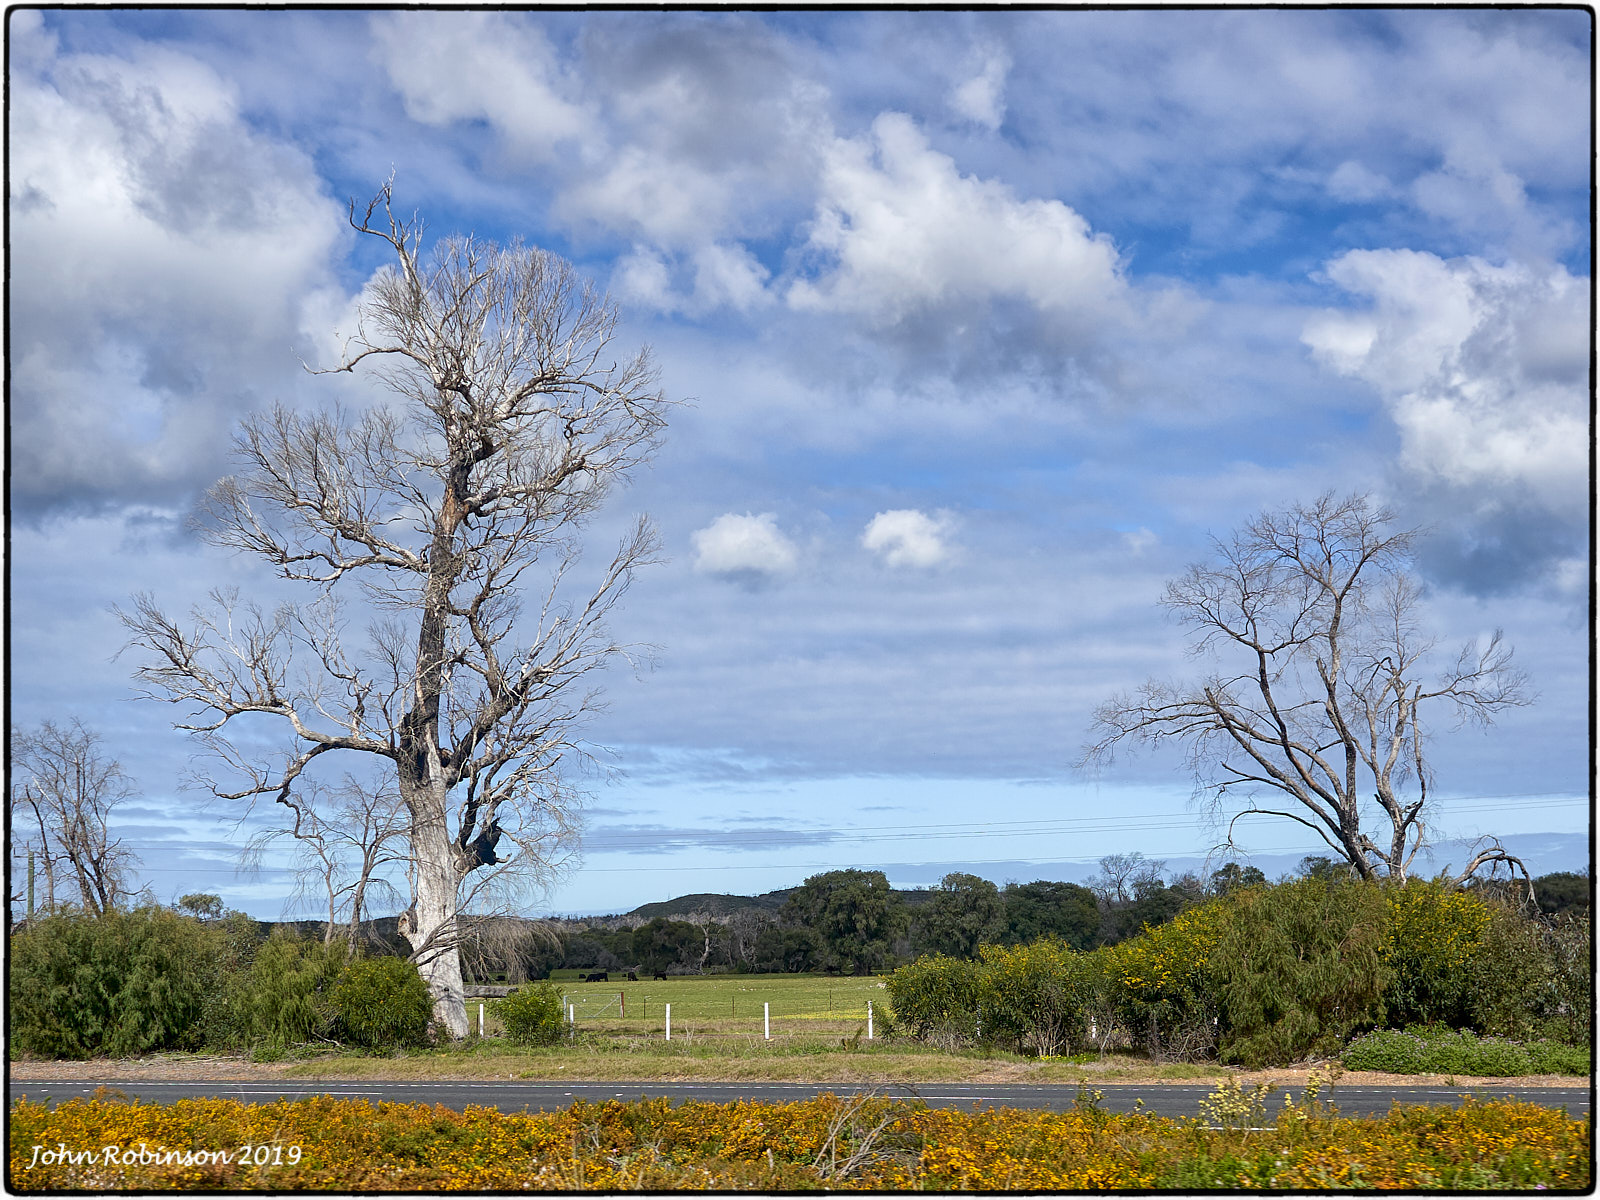 Death by the roadside in South Western Australia